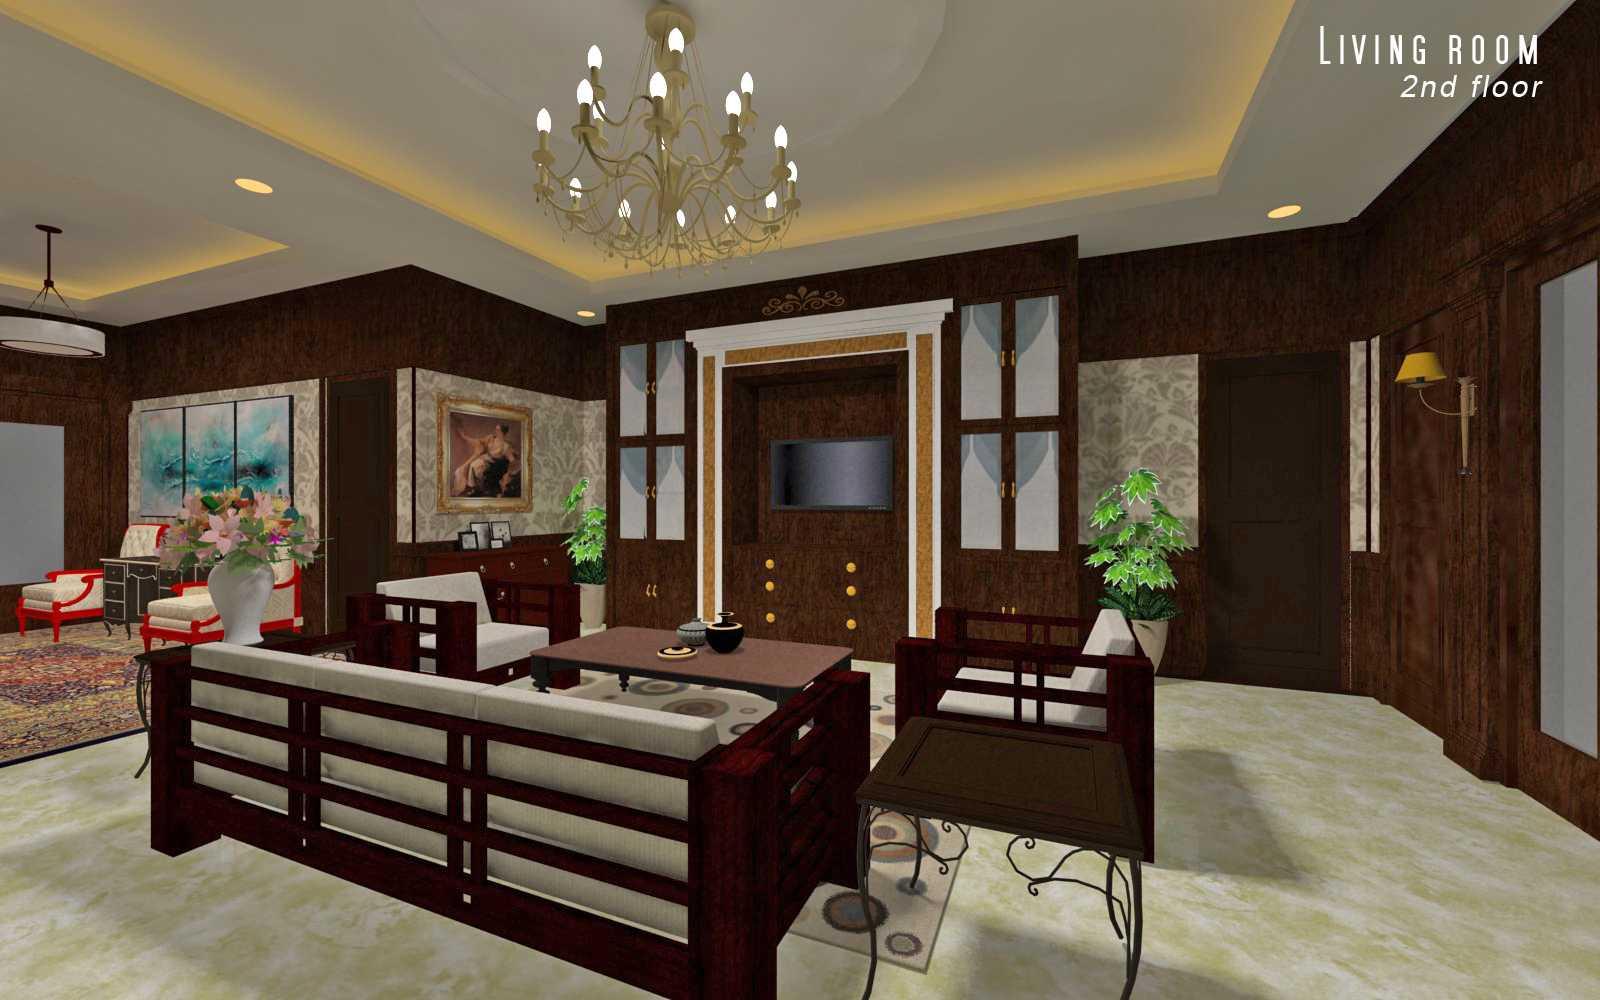 Adi Cipta Estetika Classic Interiors Design Medan Medan Living 2Nd Floor Klasik  20040